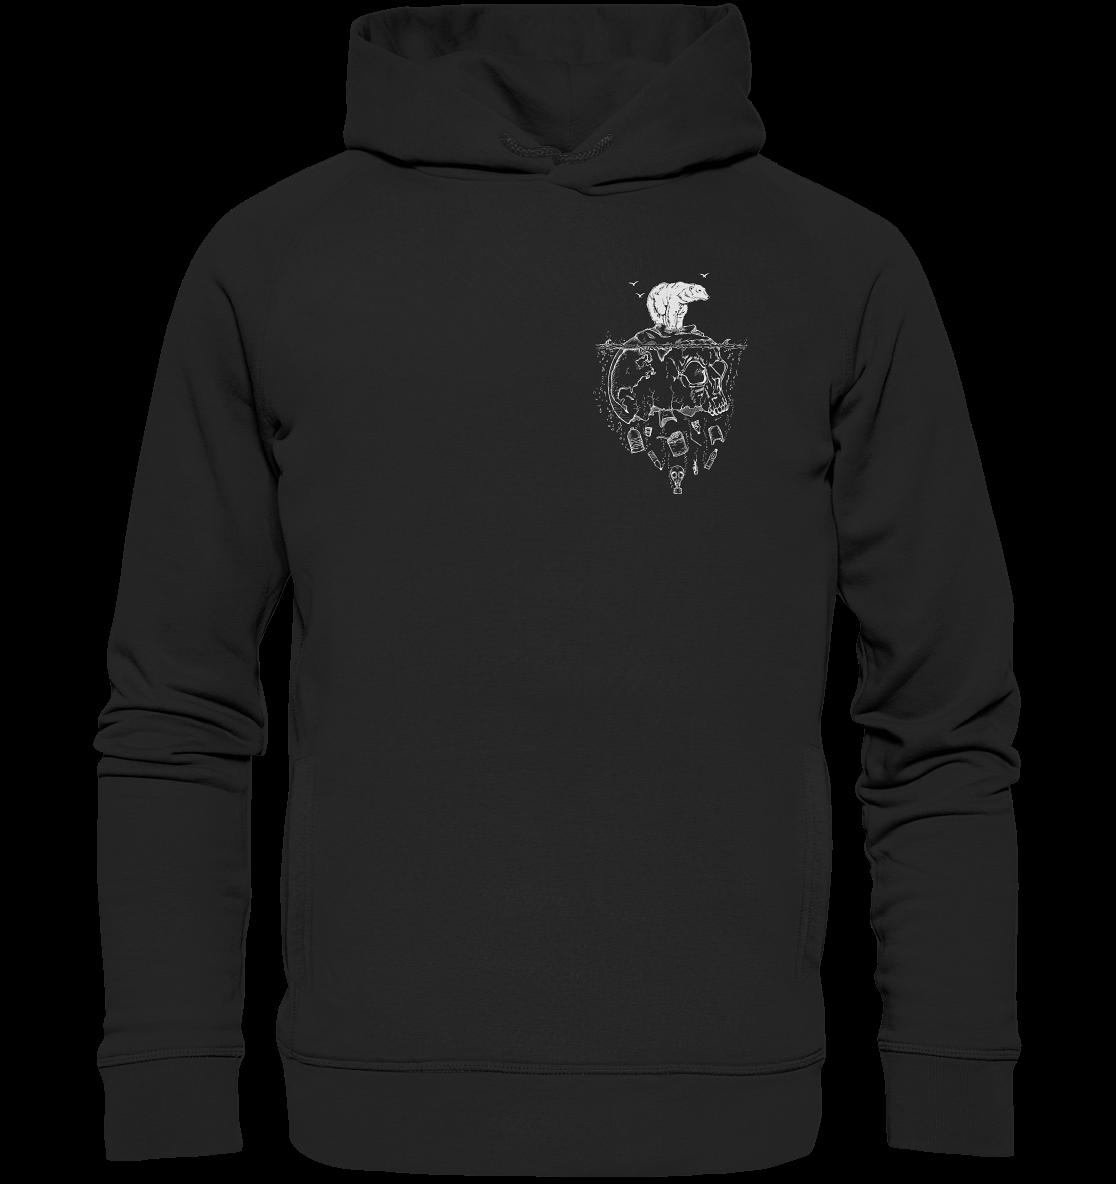 front-organic-fashion-hoodie-272727-1116x-16.png